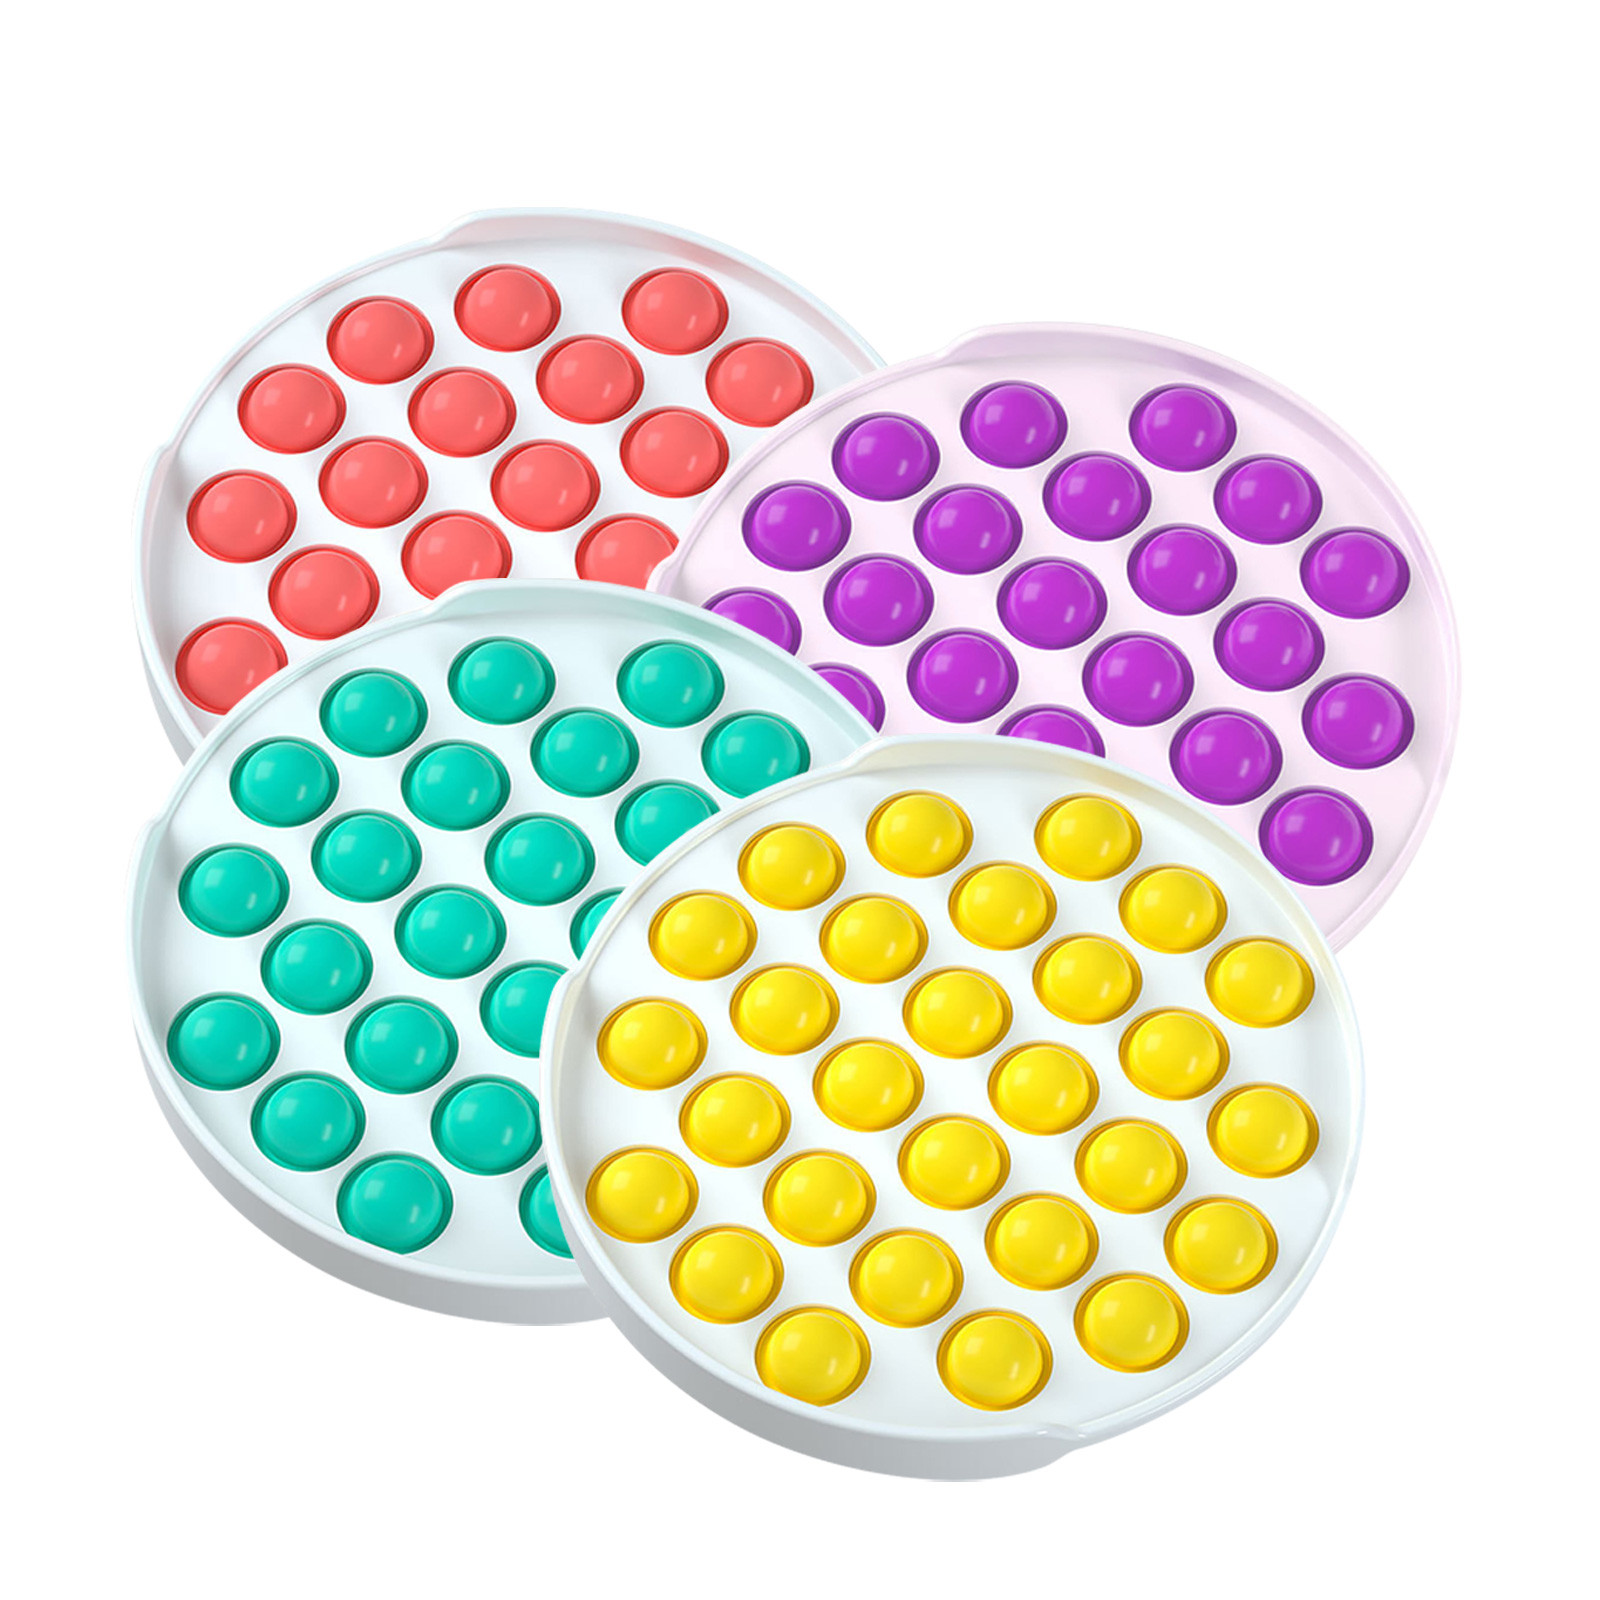 Toys Autism Anti-Stress Rainbow Bubble-Sensory Pops Squishy Fidget-Push Pop-It Colorful img3